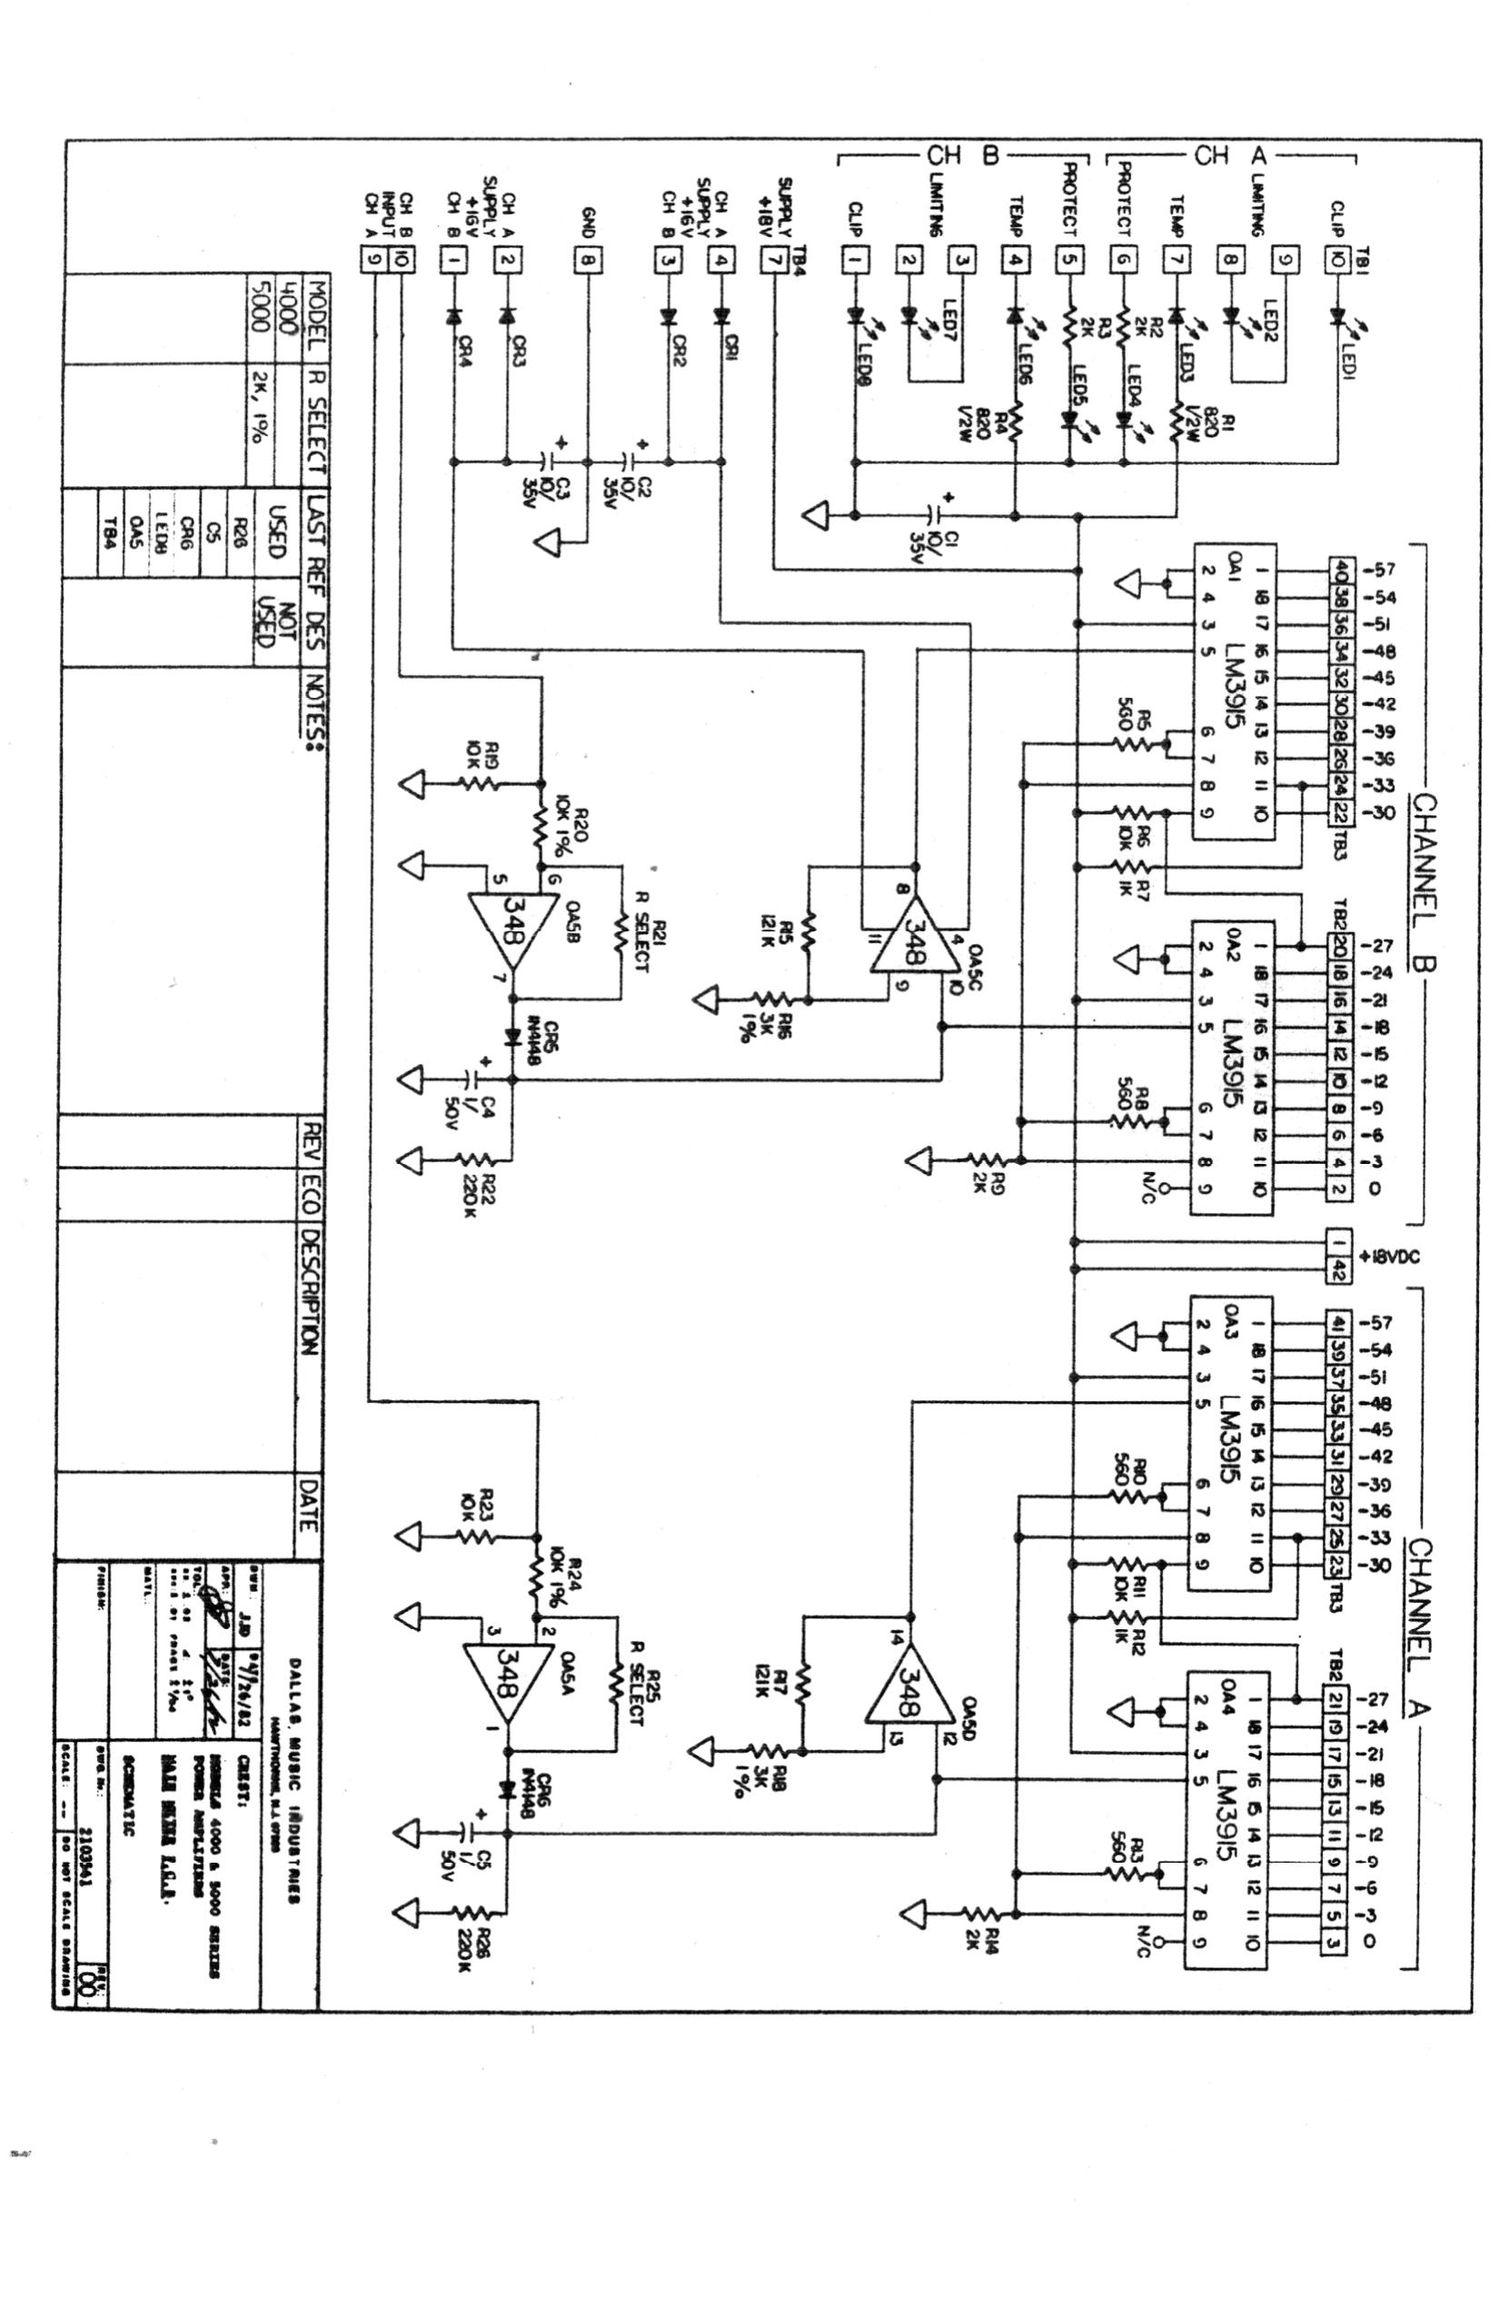 crest audio 5000 schematic rh audioservicemanuals com Beats Schematic Diagram IC Schematic Diagram